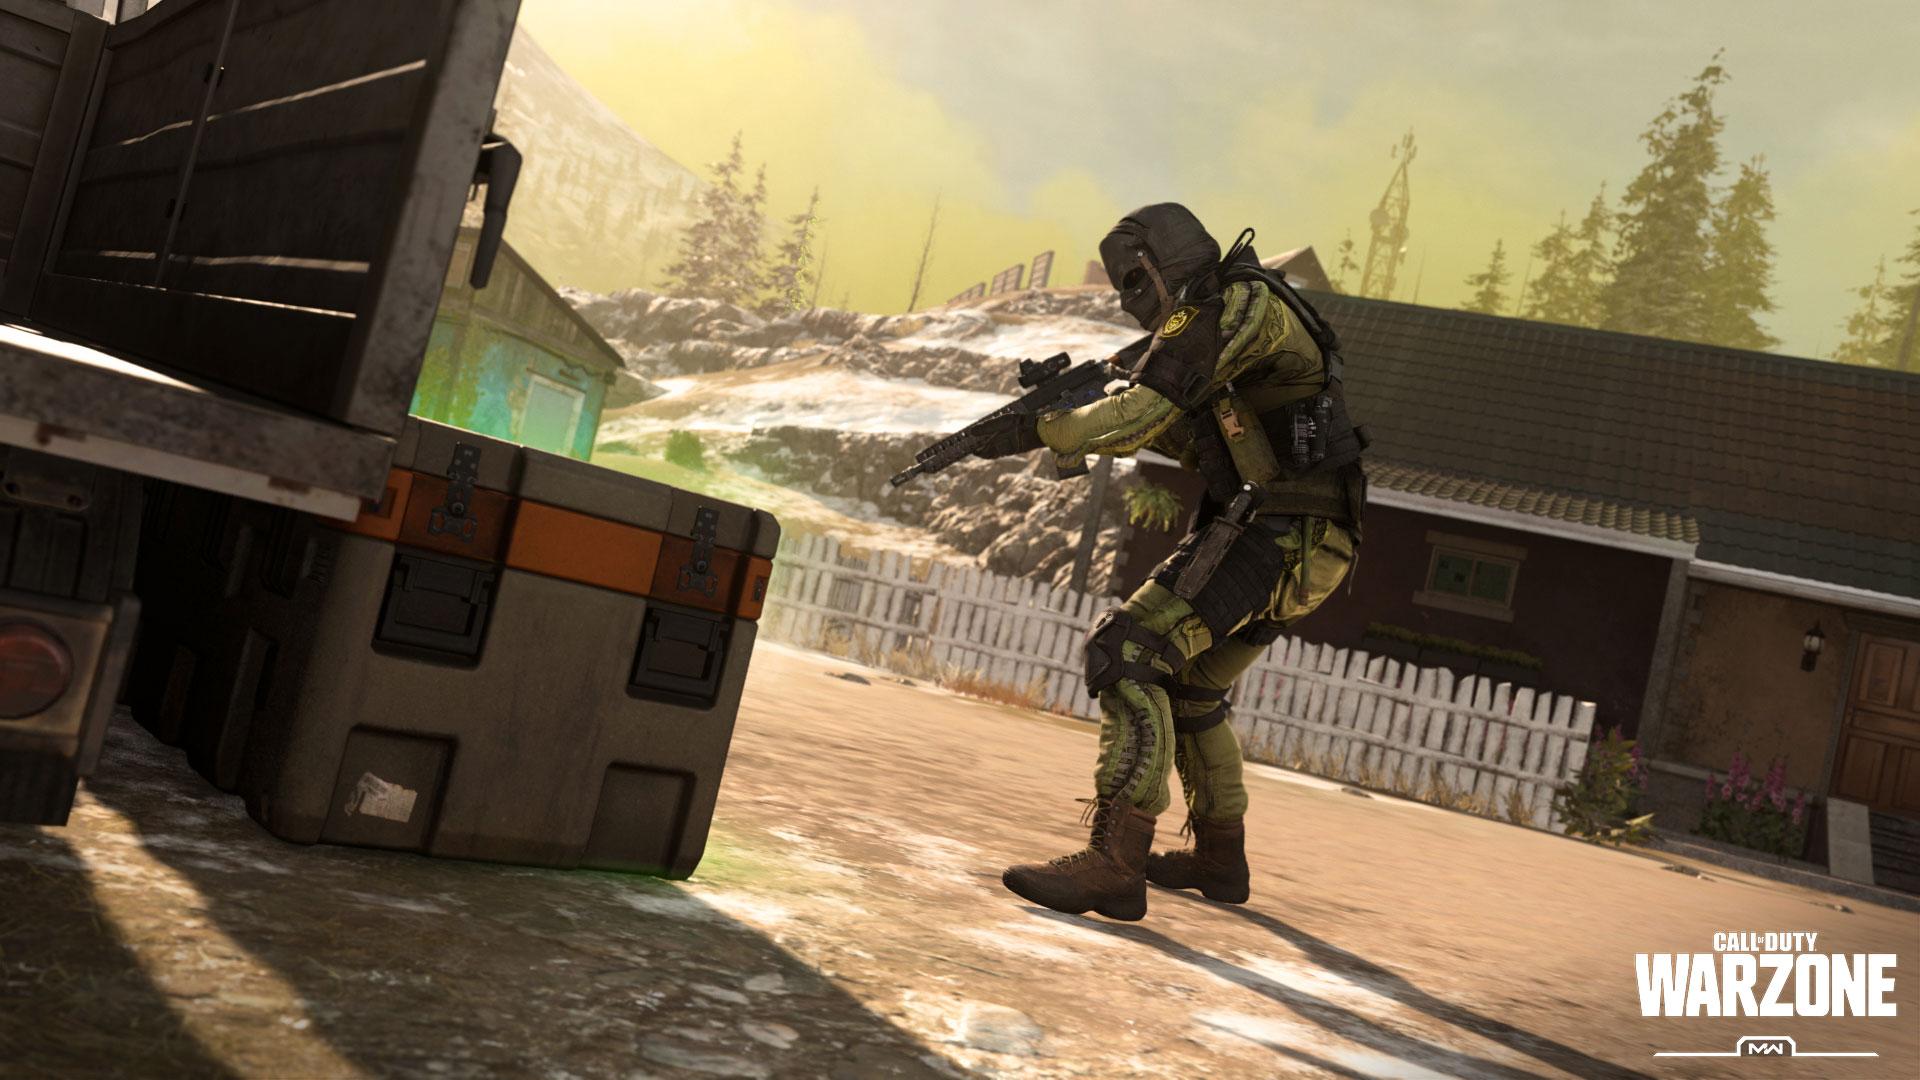 Warzone Mode Recon: Battle Royale - Image 4